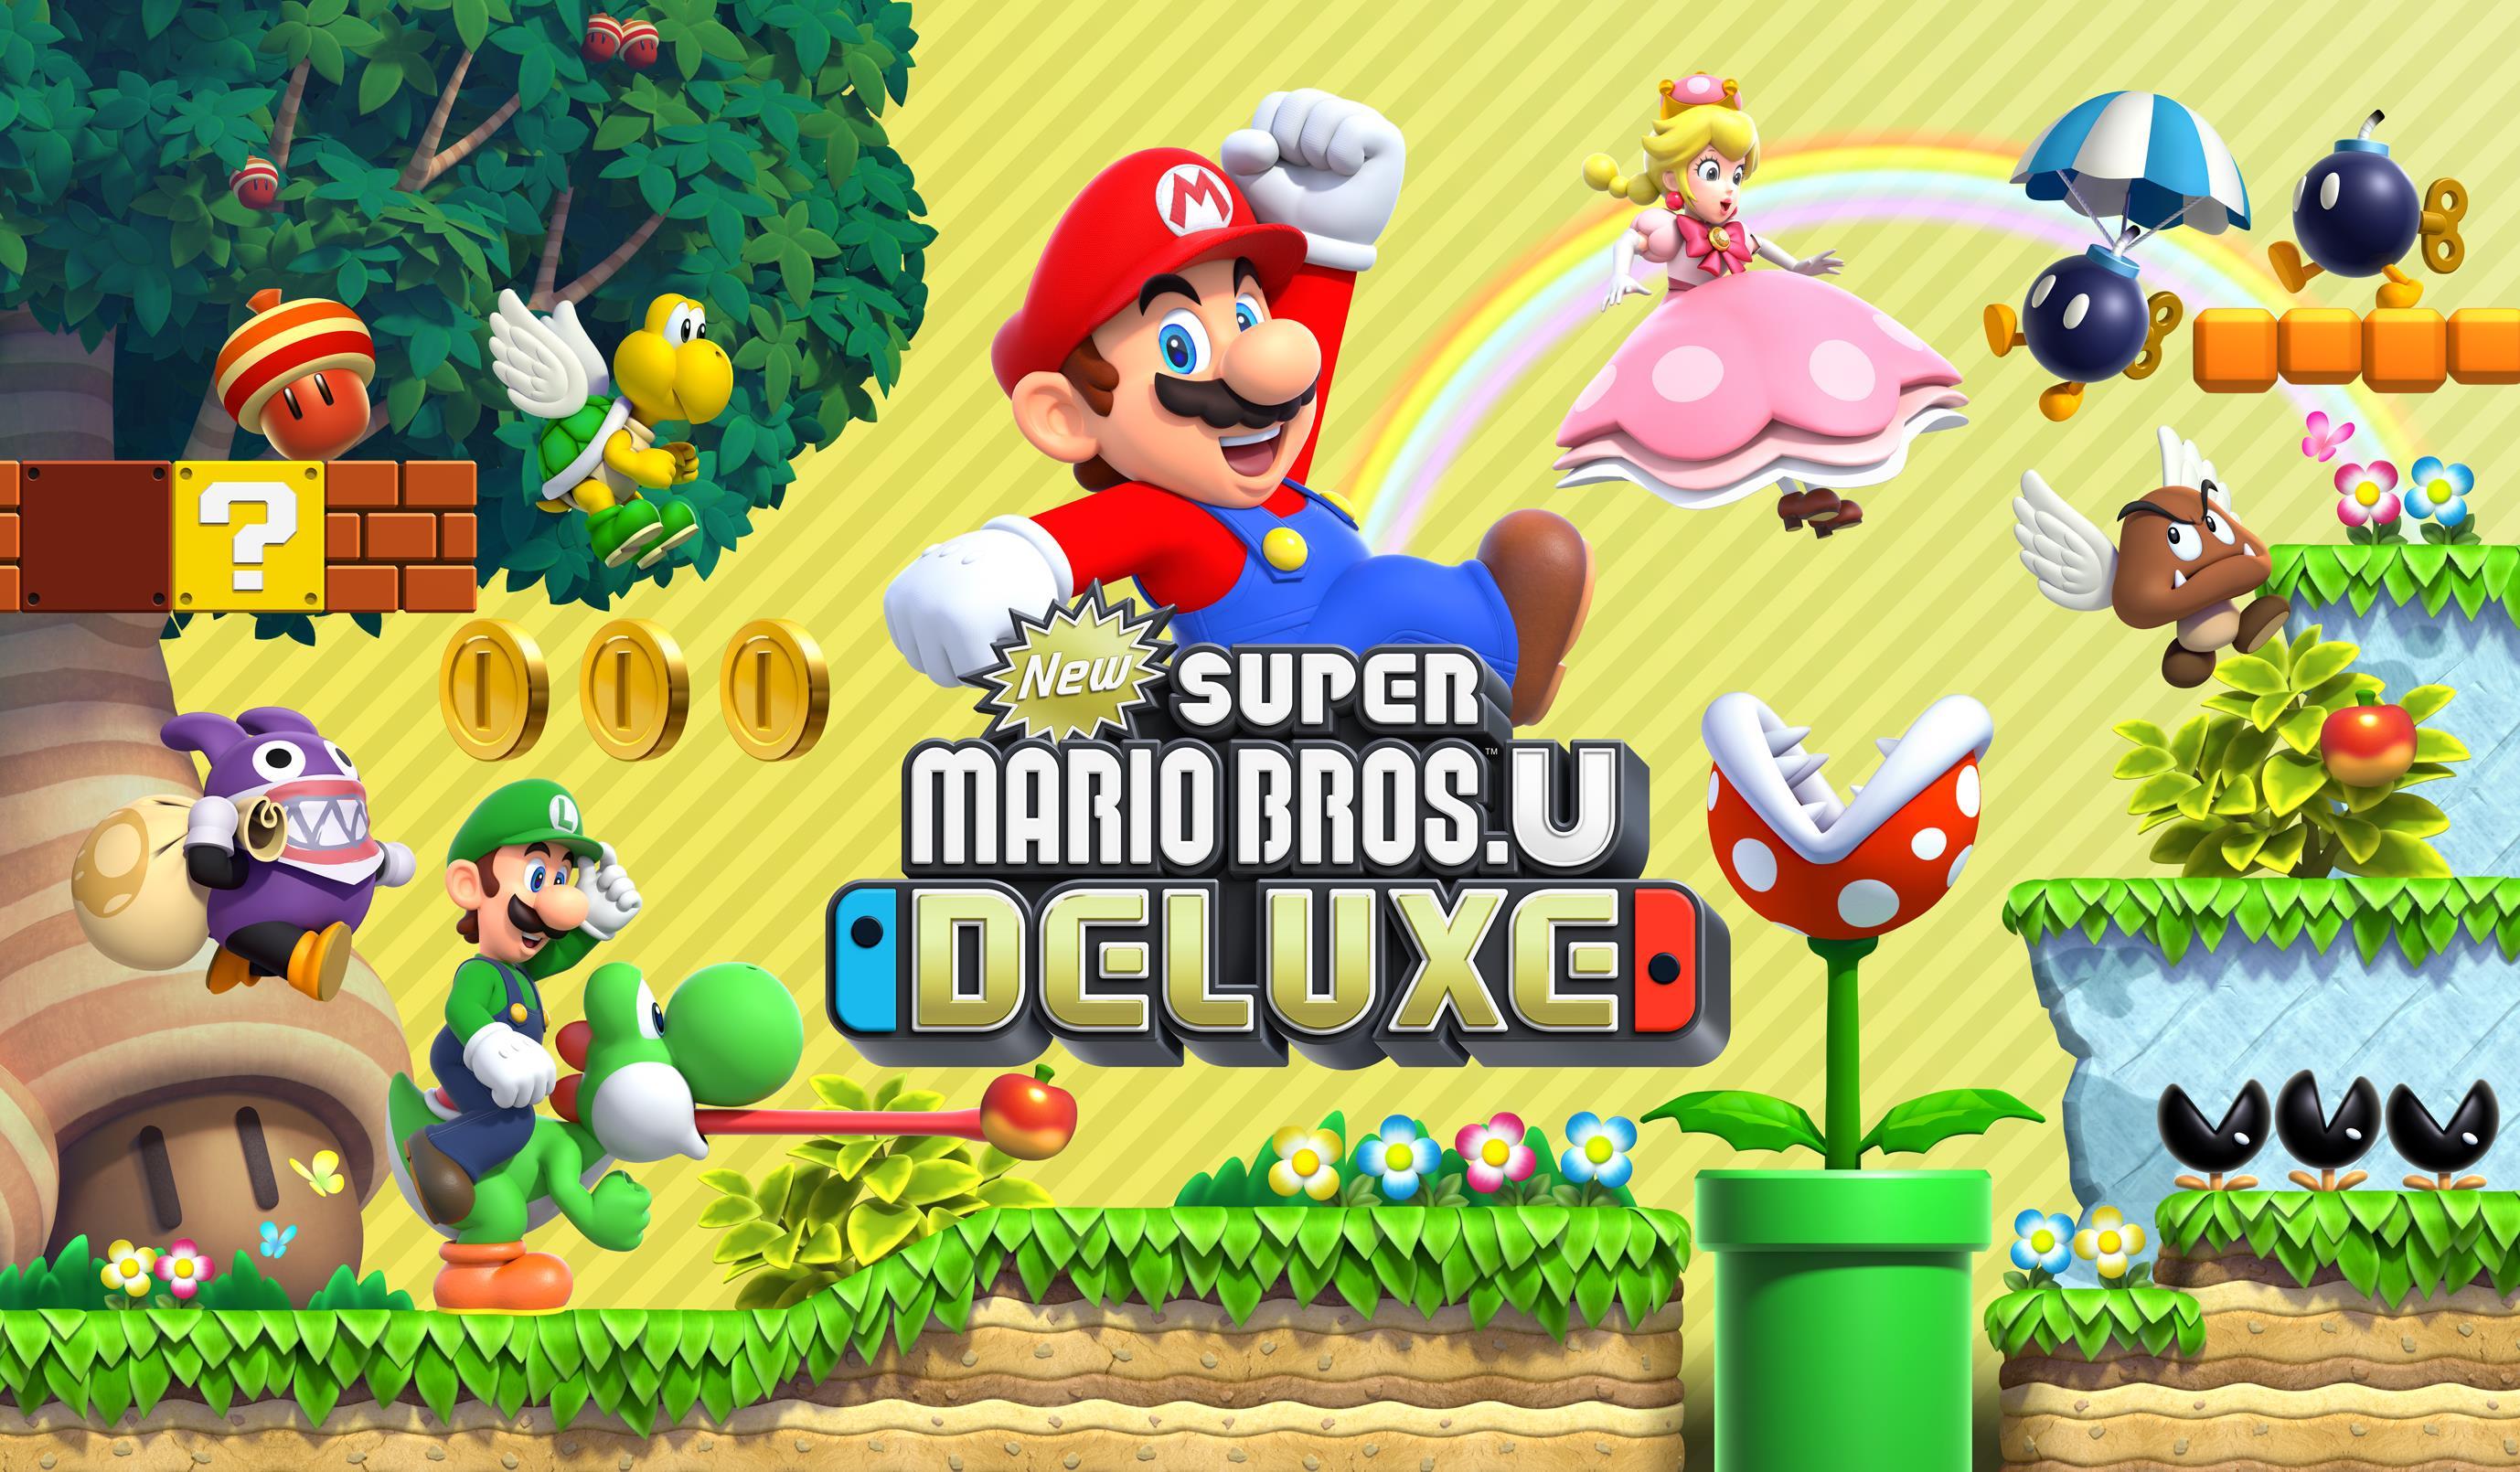 New Super Mario Bros U Deluxe Secret Exits How To Find All Secret